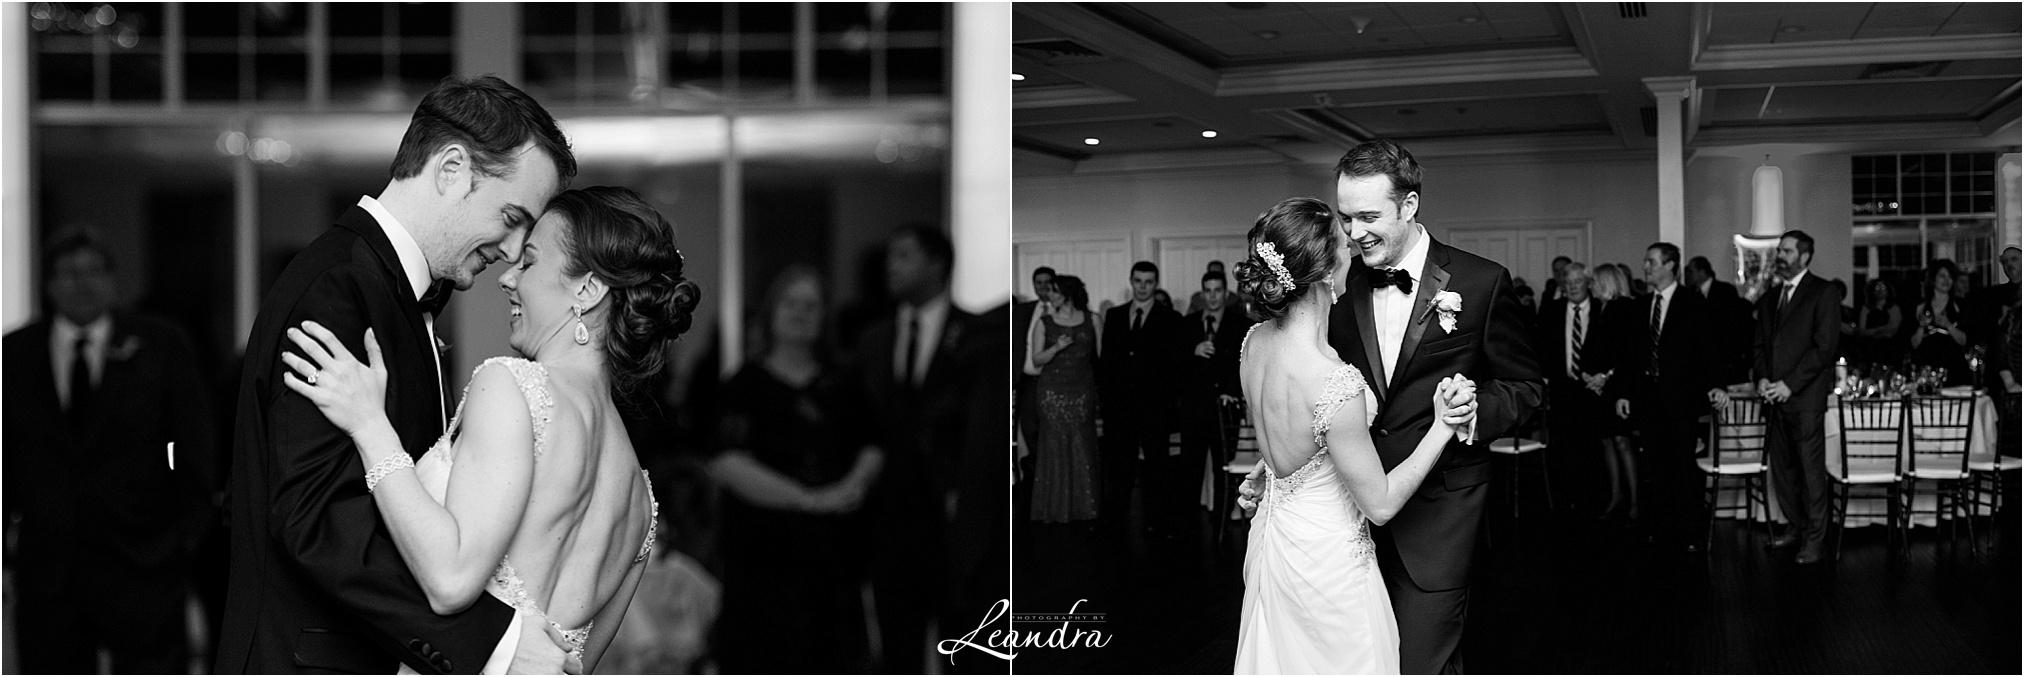 Bride and Groom First Dance Stonebridge Country Club Wedding_0039.jpg